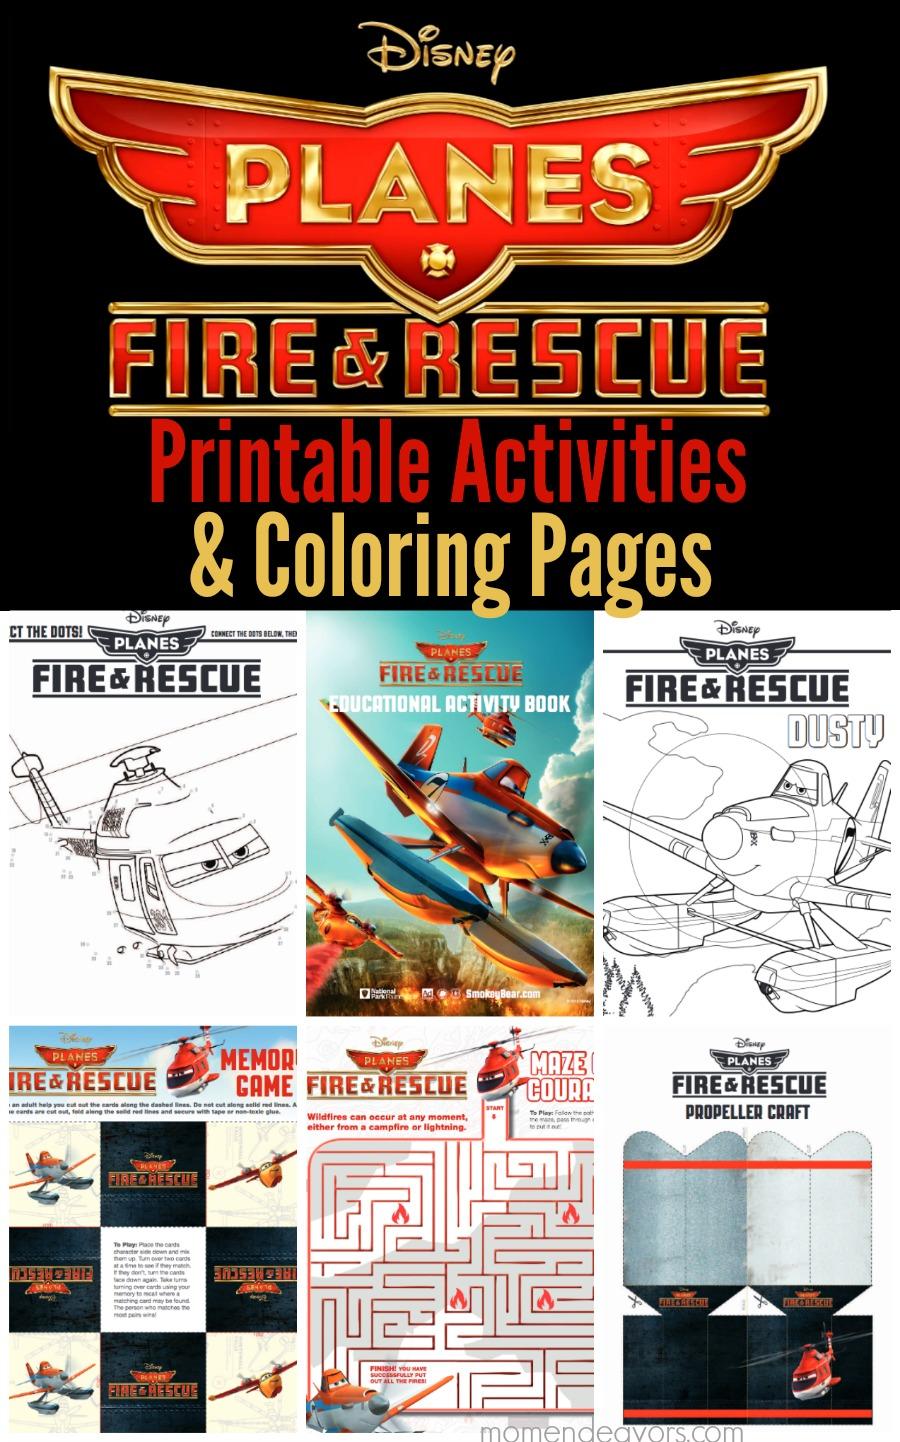 Disney Planes Fire & Rescue Printable Activities ...